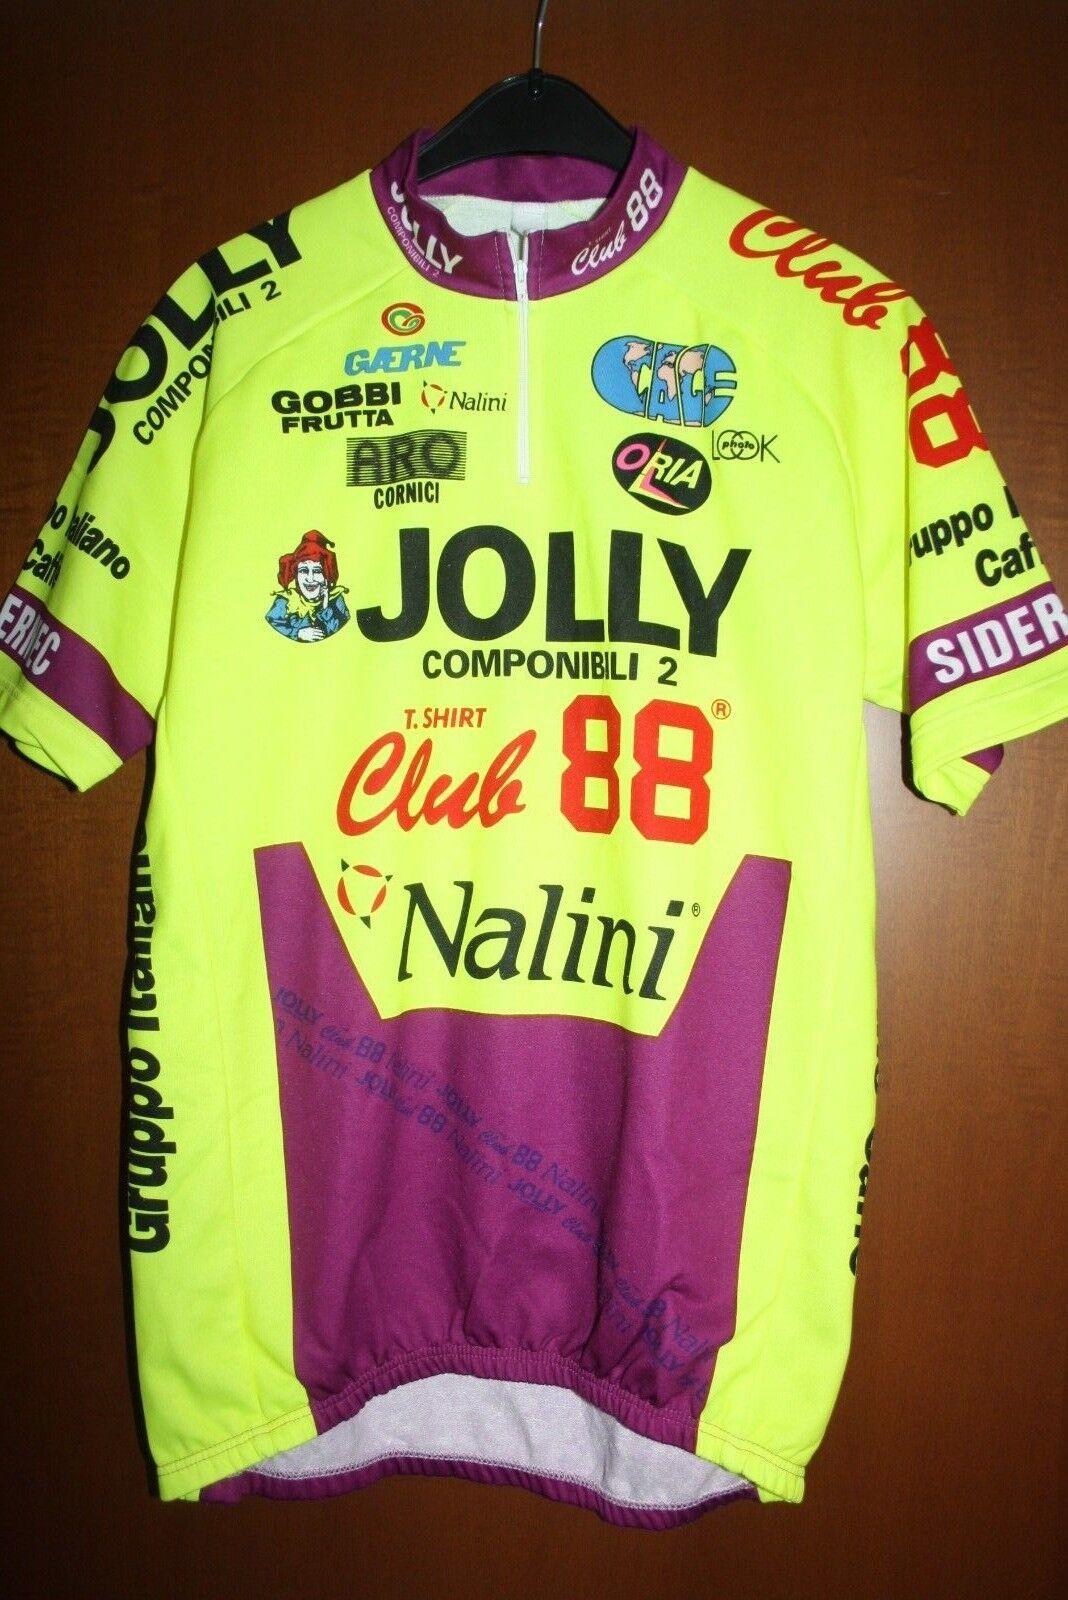 Maglia Radtrikot Shirt Maillot Ciclismo Jolly Componibili Club 88 Nalini Giro 93